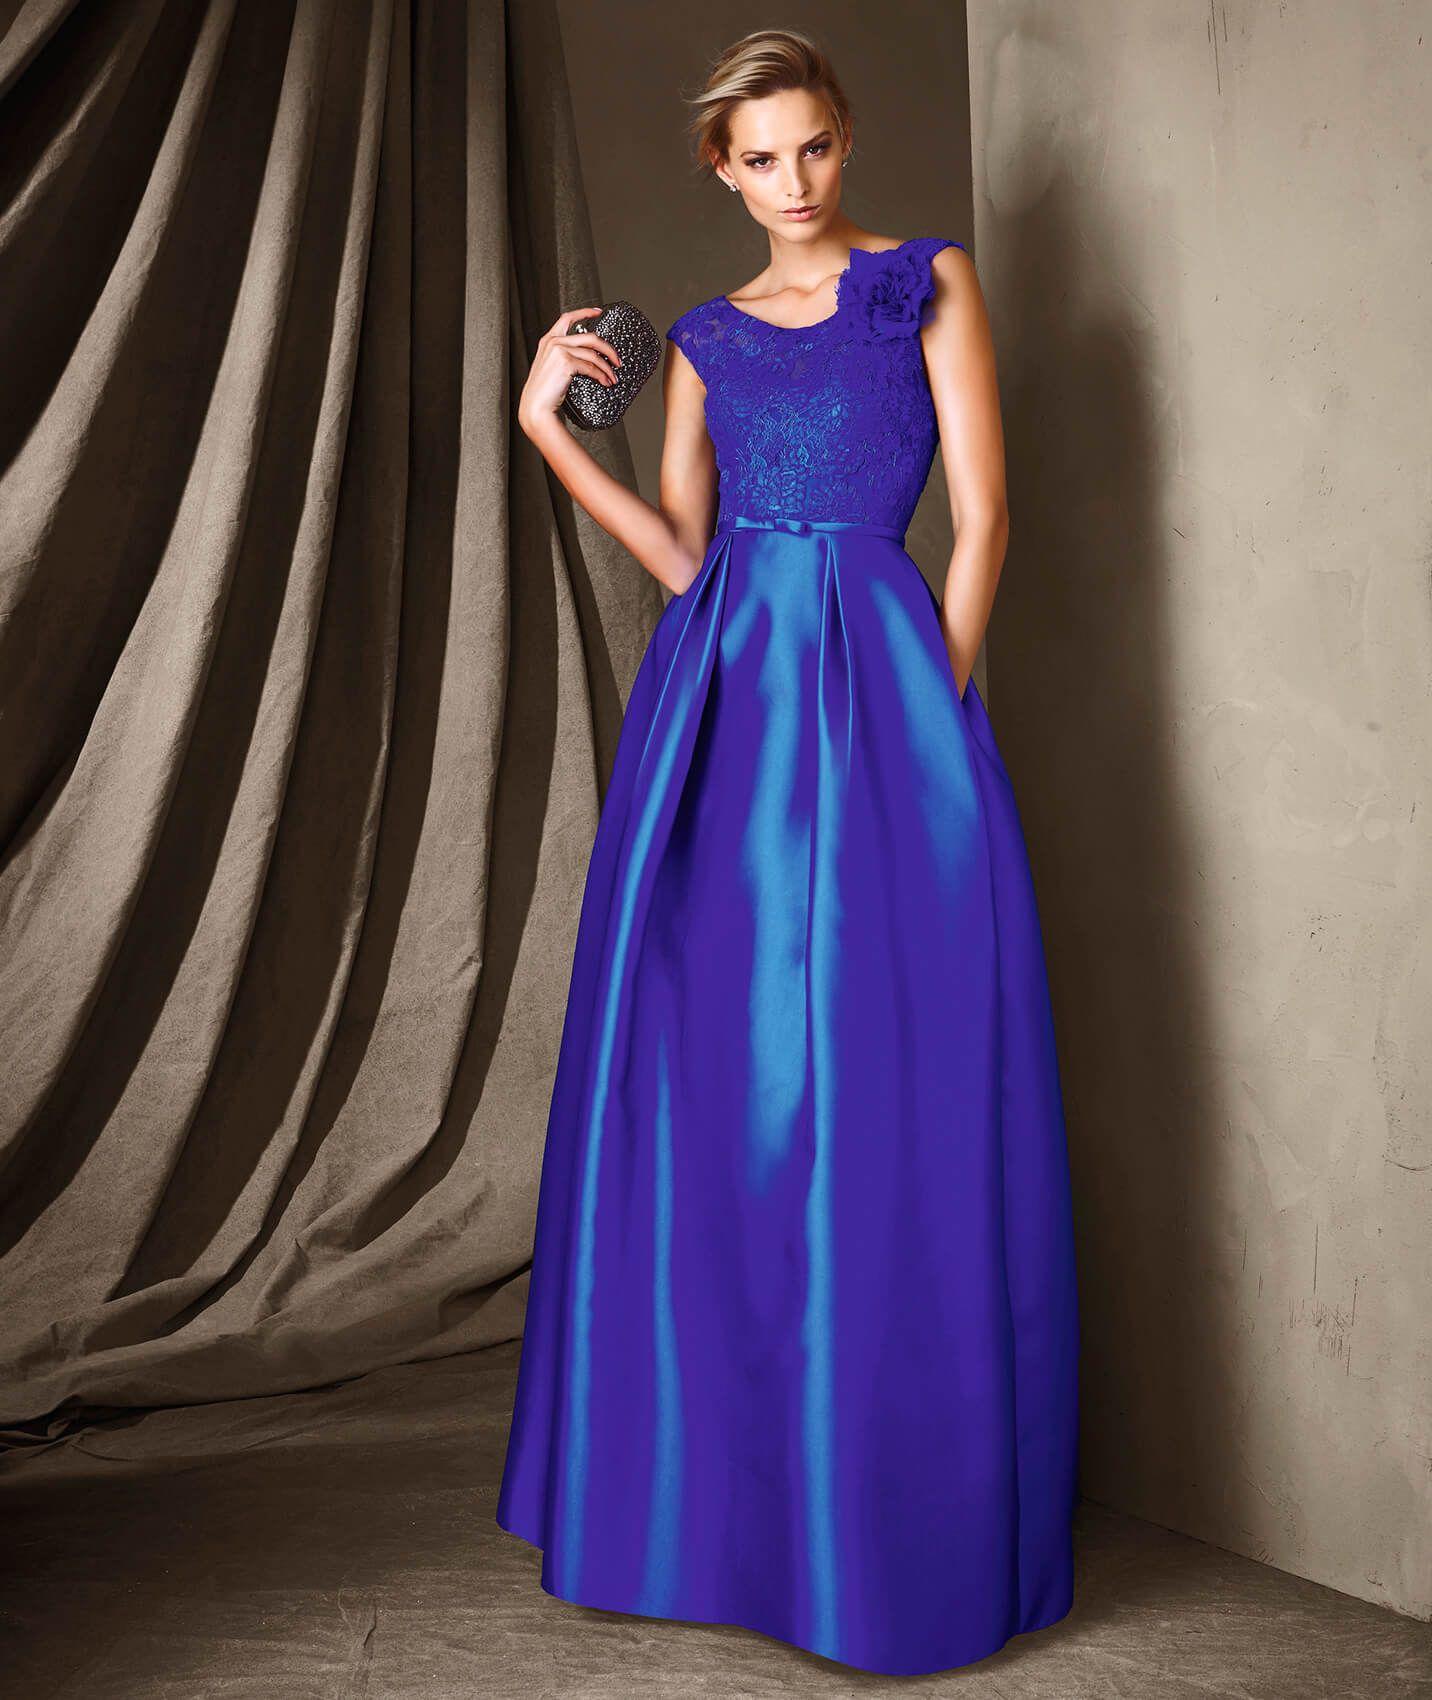 Pronovias Royal Blue Sleeveless CANDI Style Cocktail Dress 2017 ...